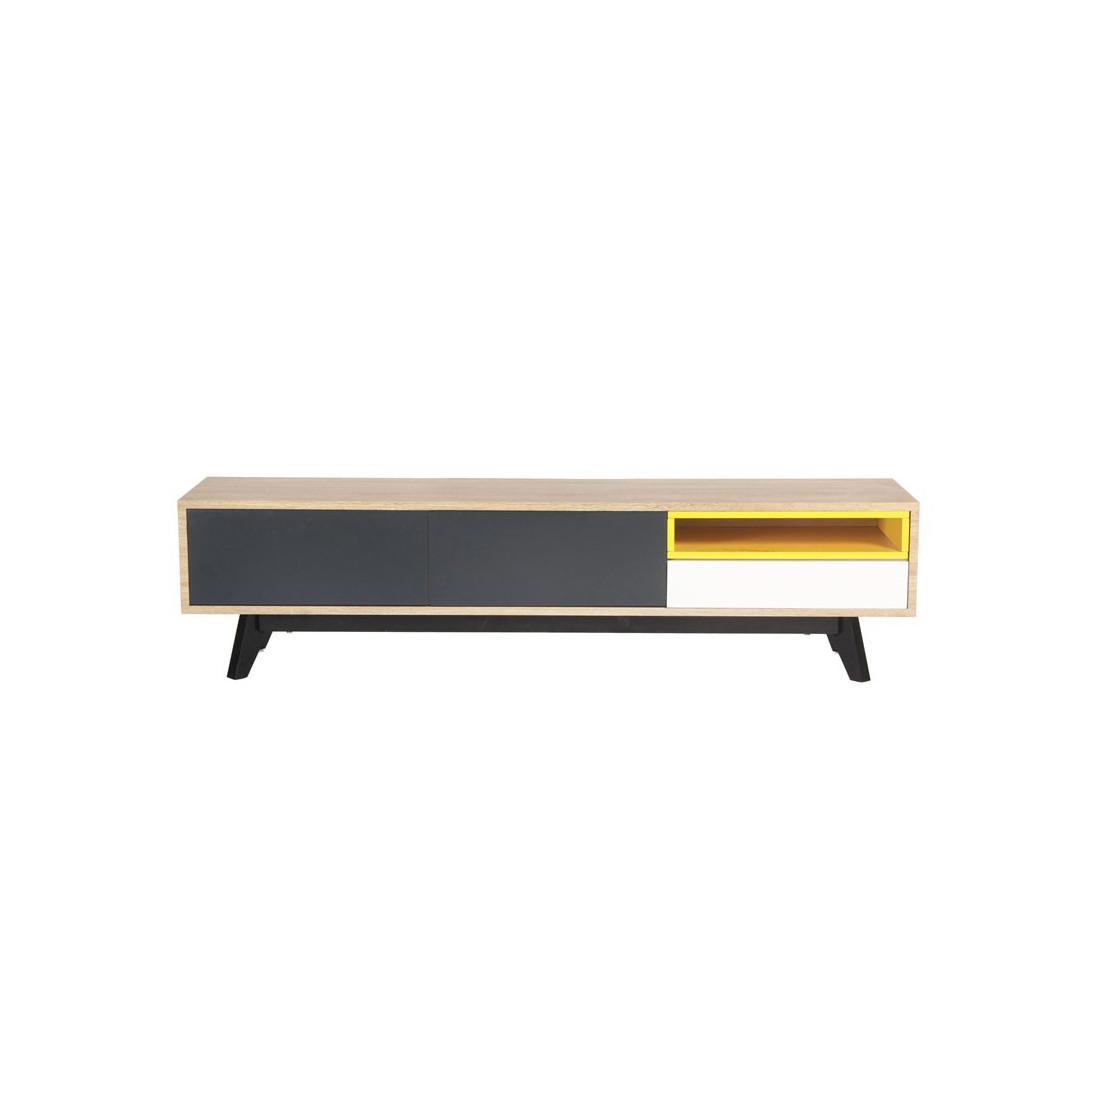 Meuble tv 2 portes 1 tiroir jaune gris blanc scud for Meuble tv a tiroir